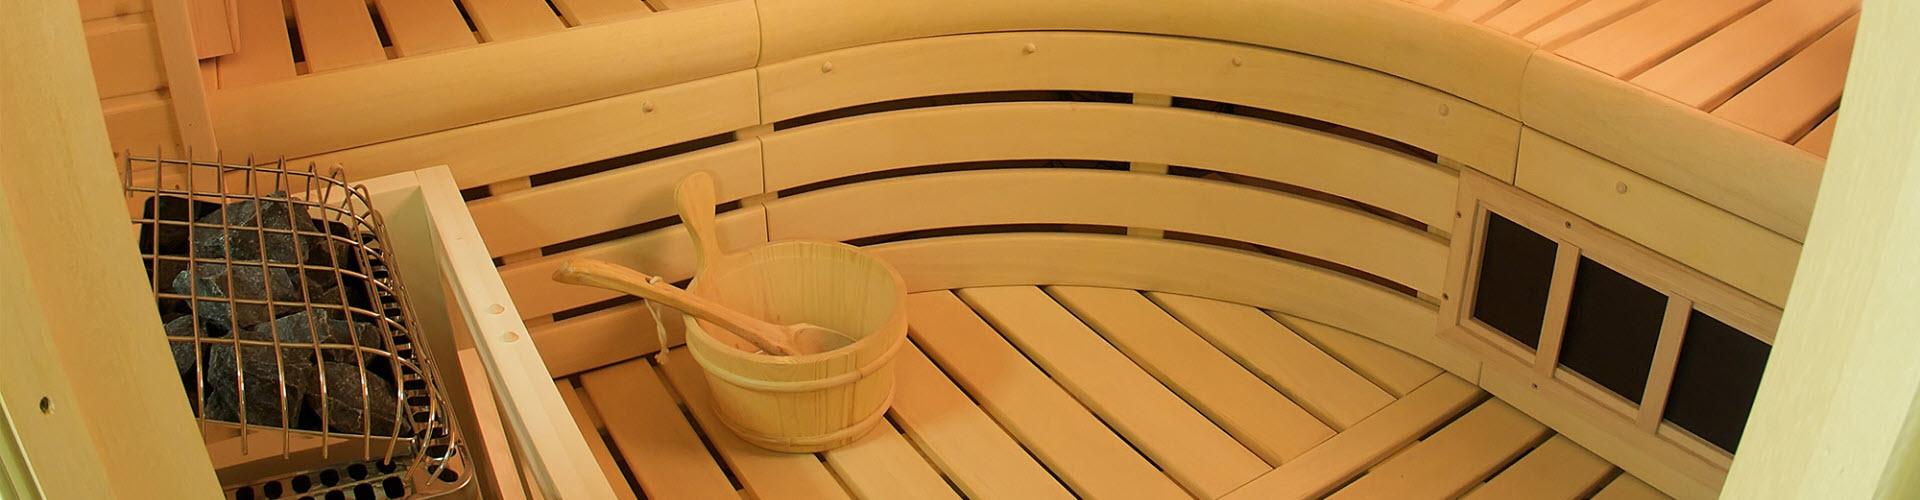 Sauna Use and Cardiovascular Health, Saunas Des Moines